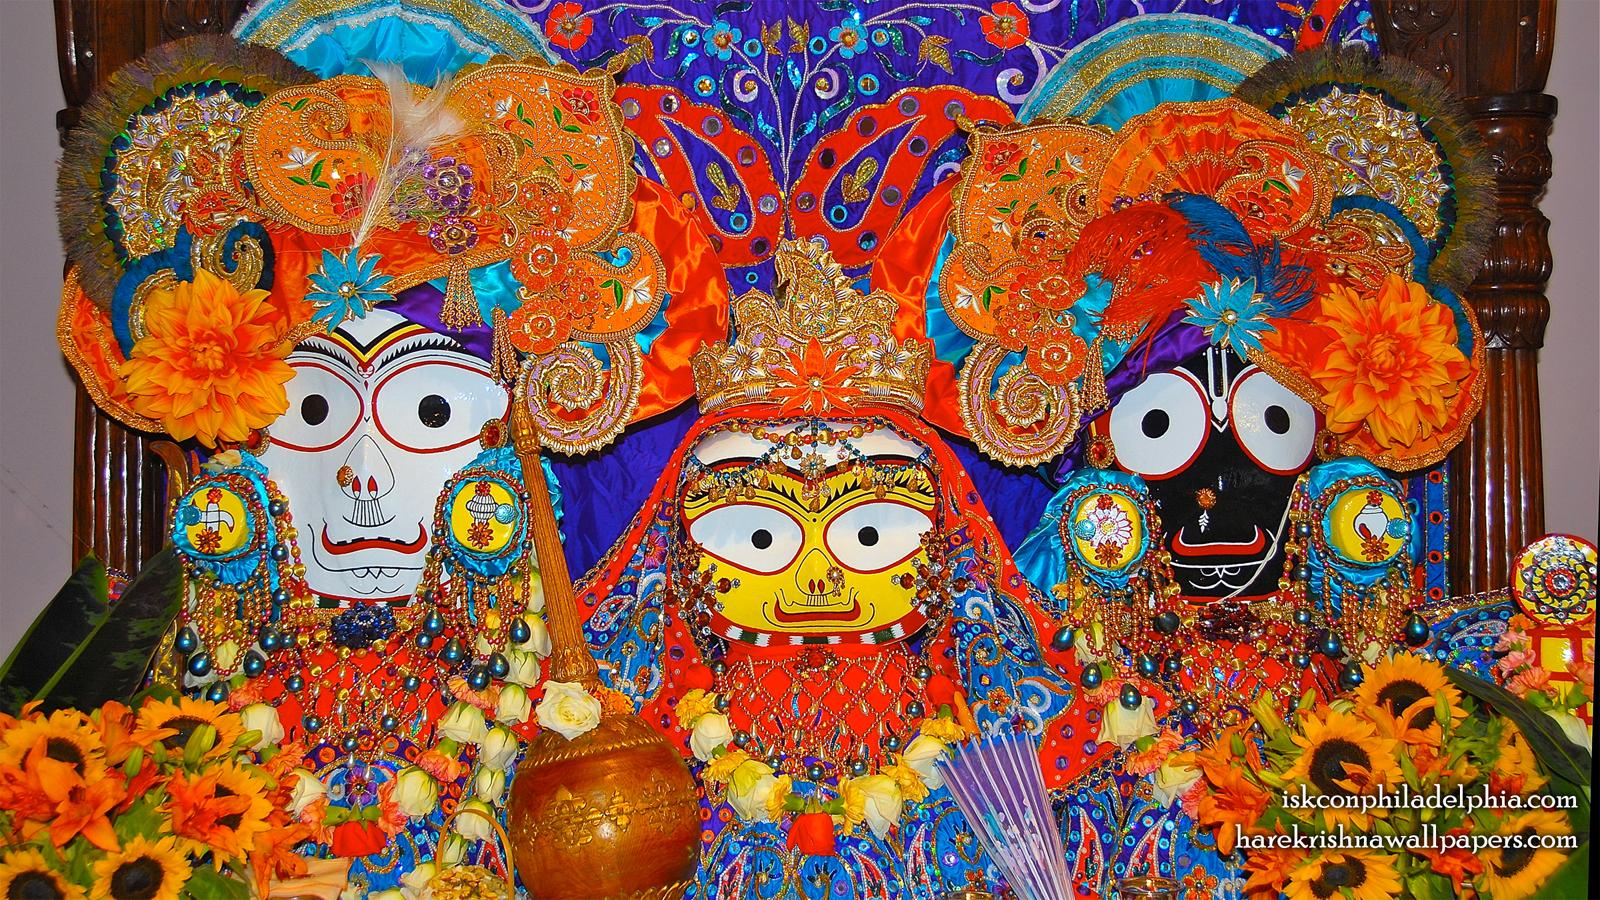 Jagannath Baladeva Subhadra Wallpaper (010) Size 1600x900 Download